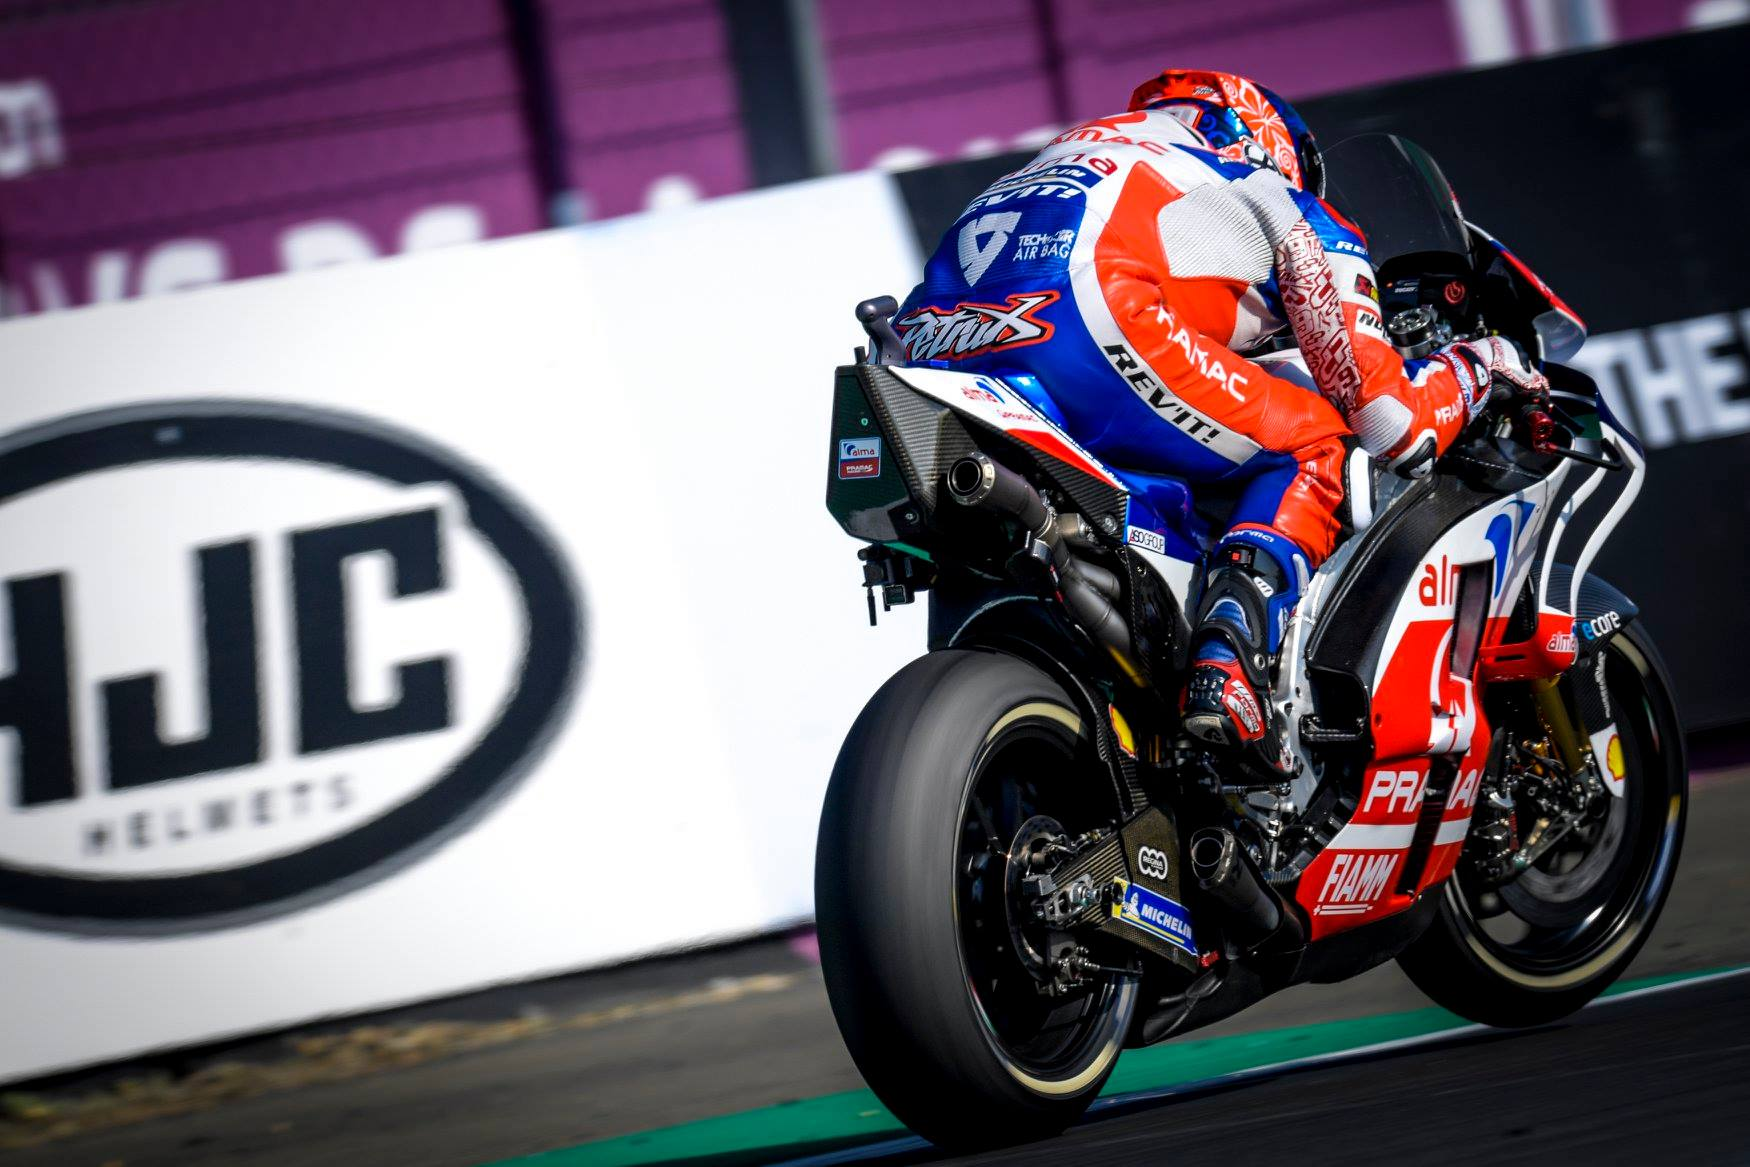 Lorenzovi dnevi pri Ducatiju so šteti